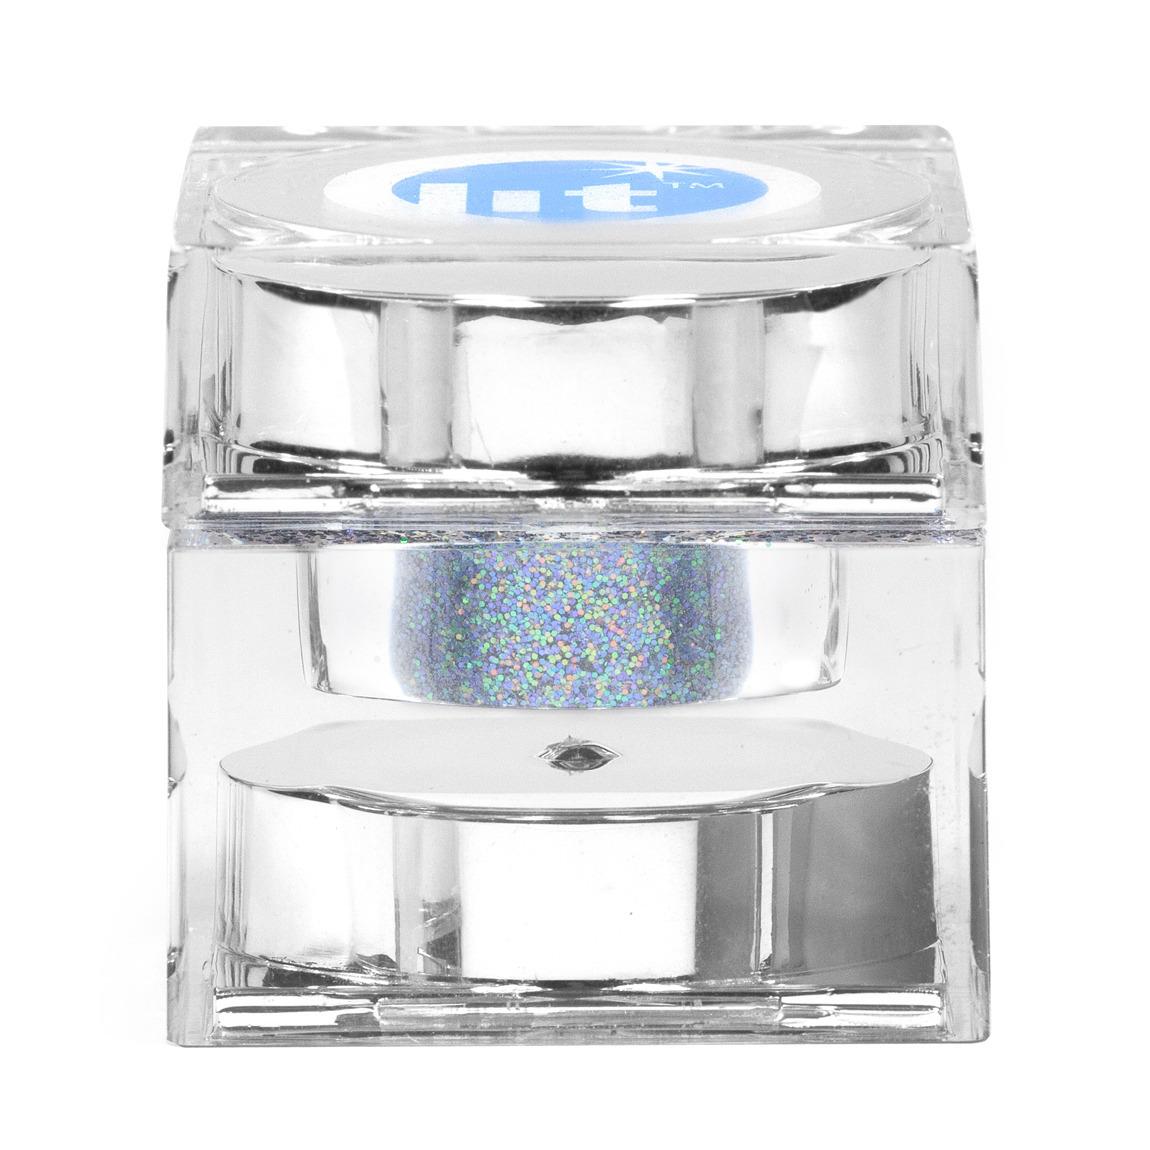 Lit Cosmetics Lit Glitter Seeing Stars S3